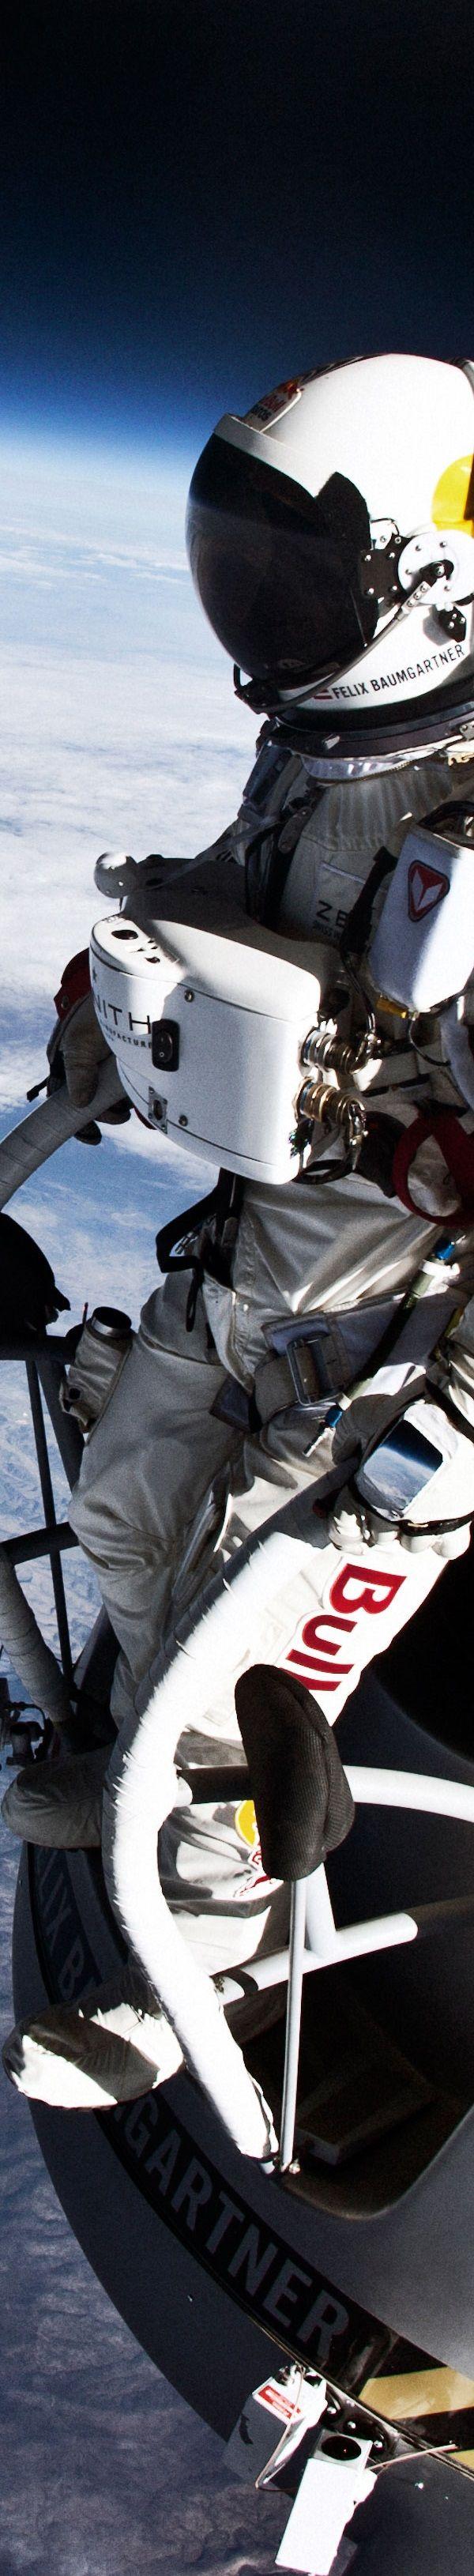 Felix Baumgartner World Record Space Jump